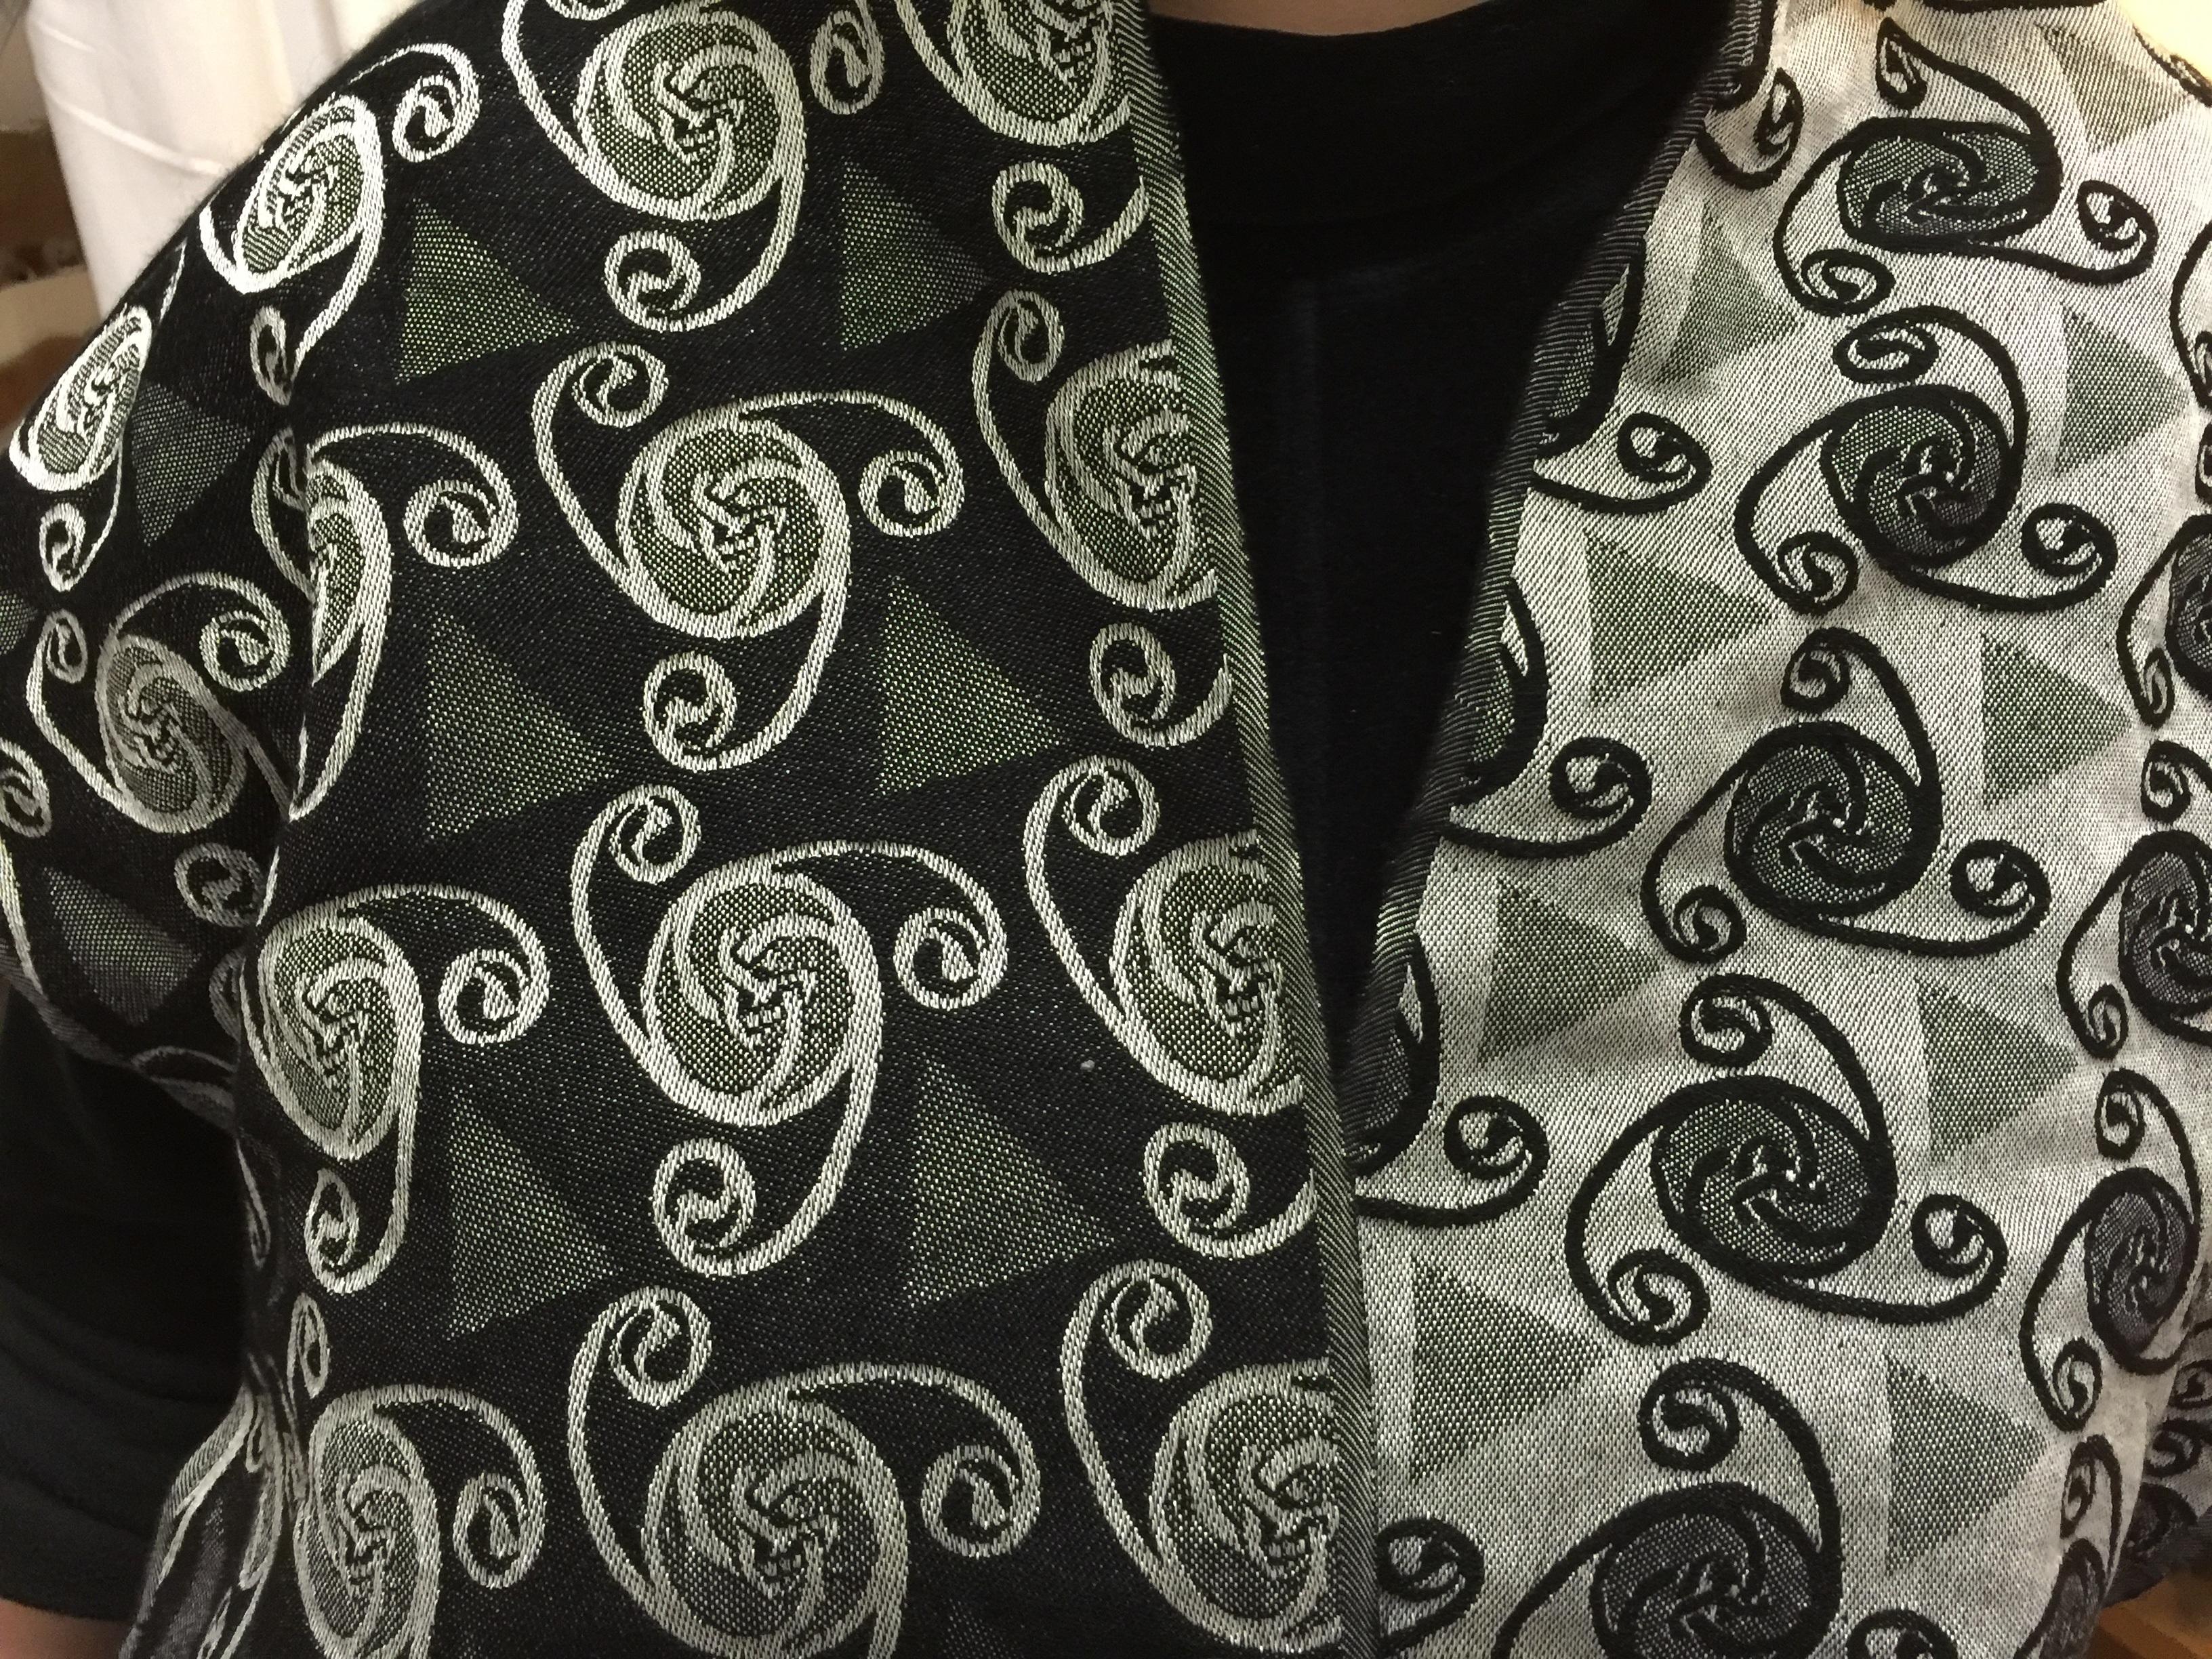 white pattern clothing black scarf material textile art design silk tissue paisley sleeve jacquardmuster hand weaving - Jacquard Muster